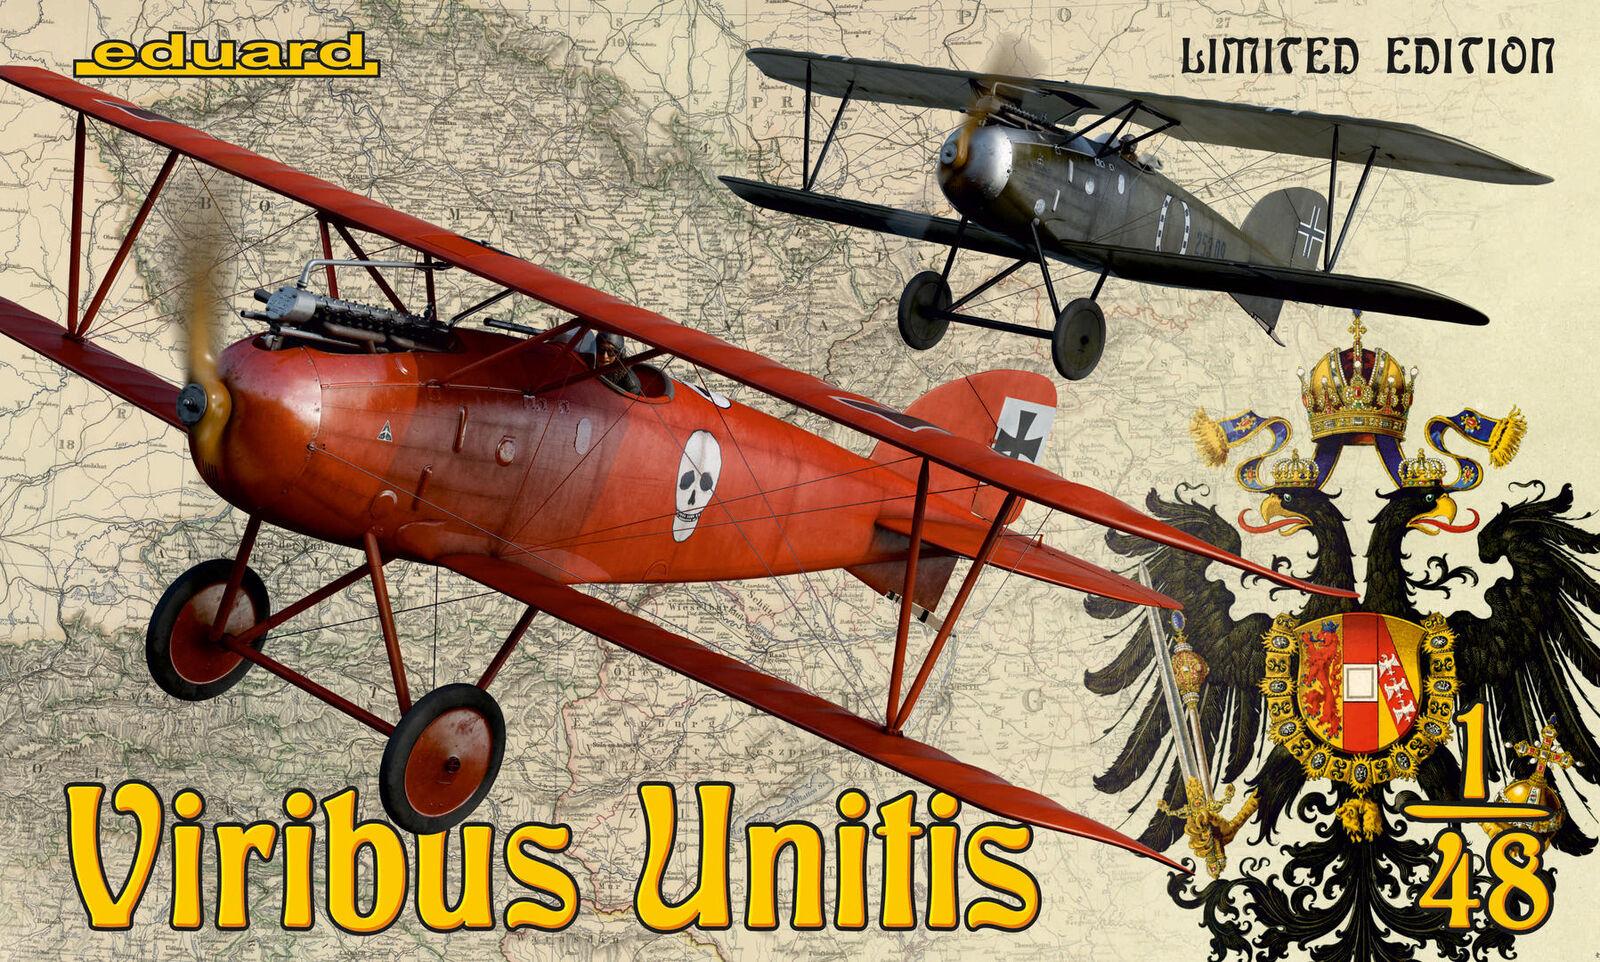 Eduard 1 48 Viribus Unitis Limited Edition Dual Combo K11124